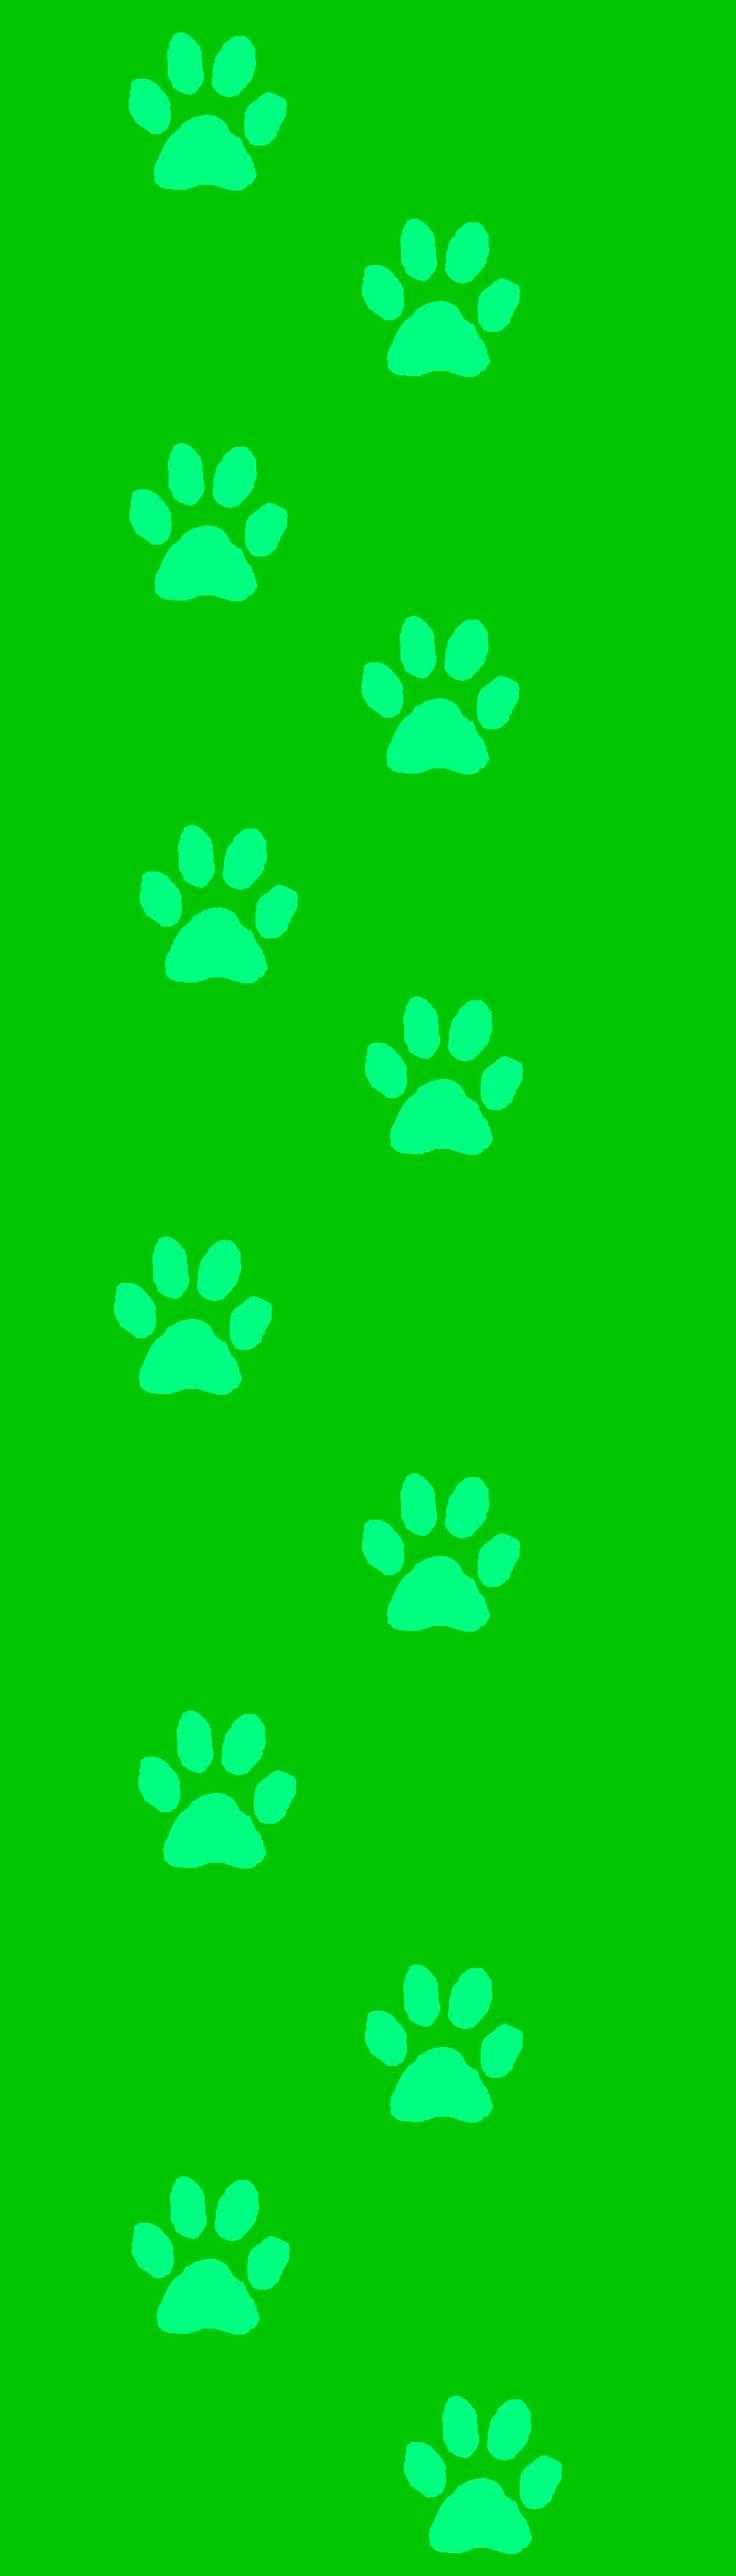 88 best images about paw prints on pinterest clip art - Dog print wallpaper ...